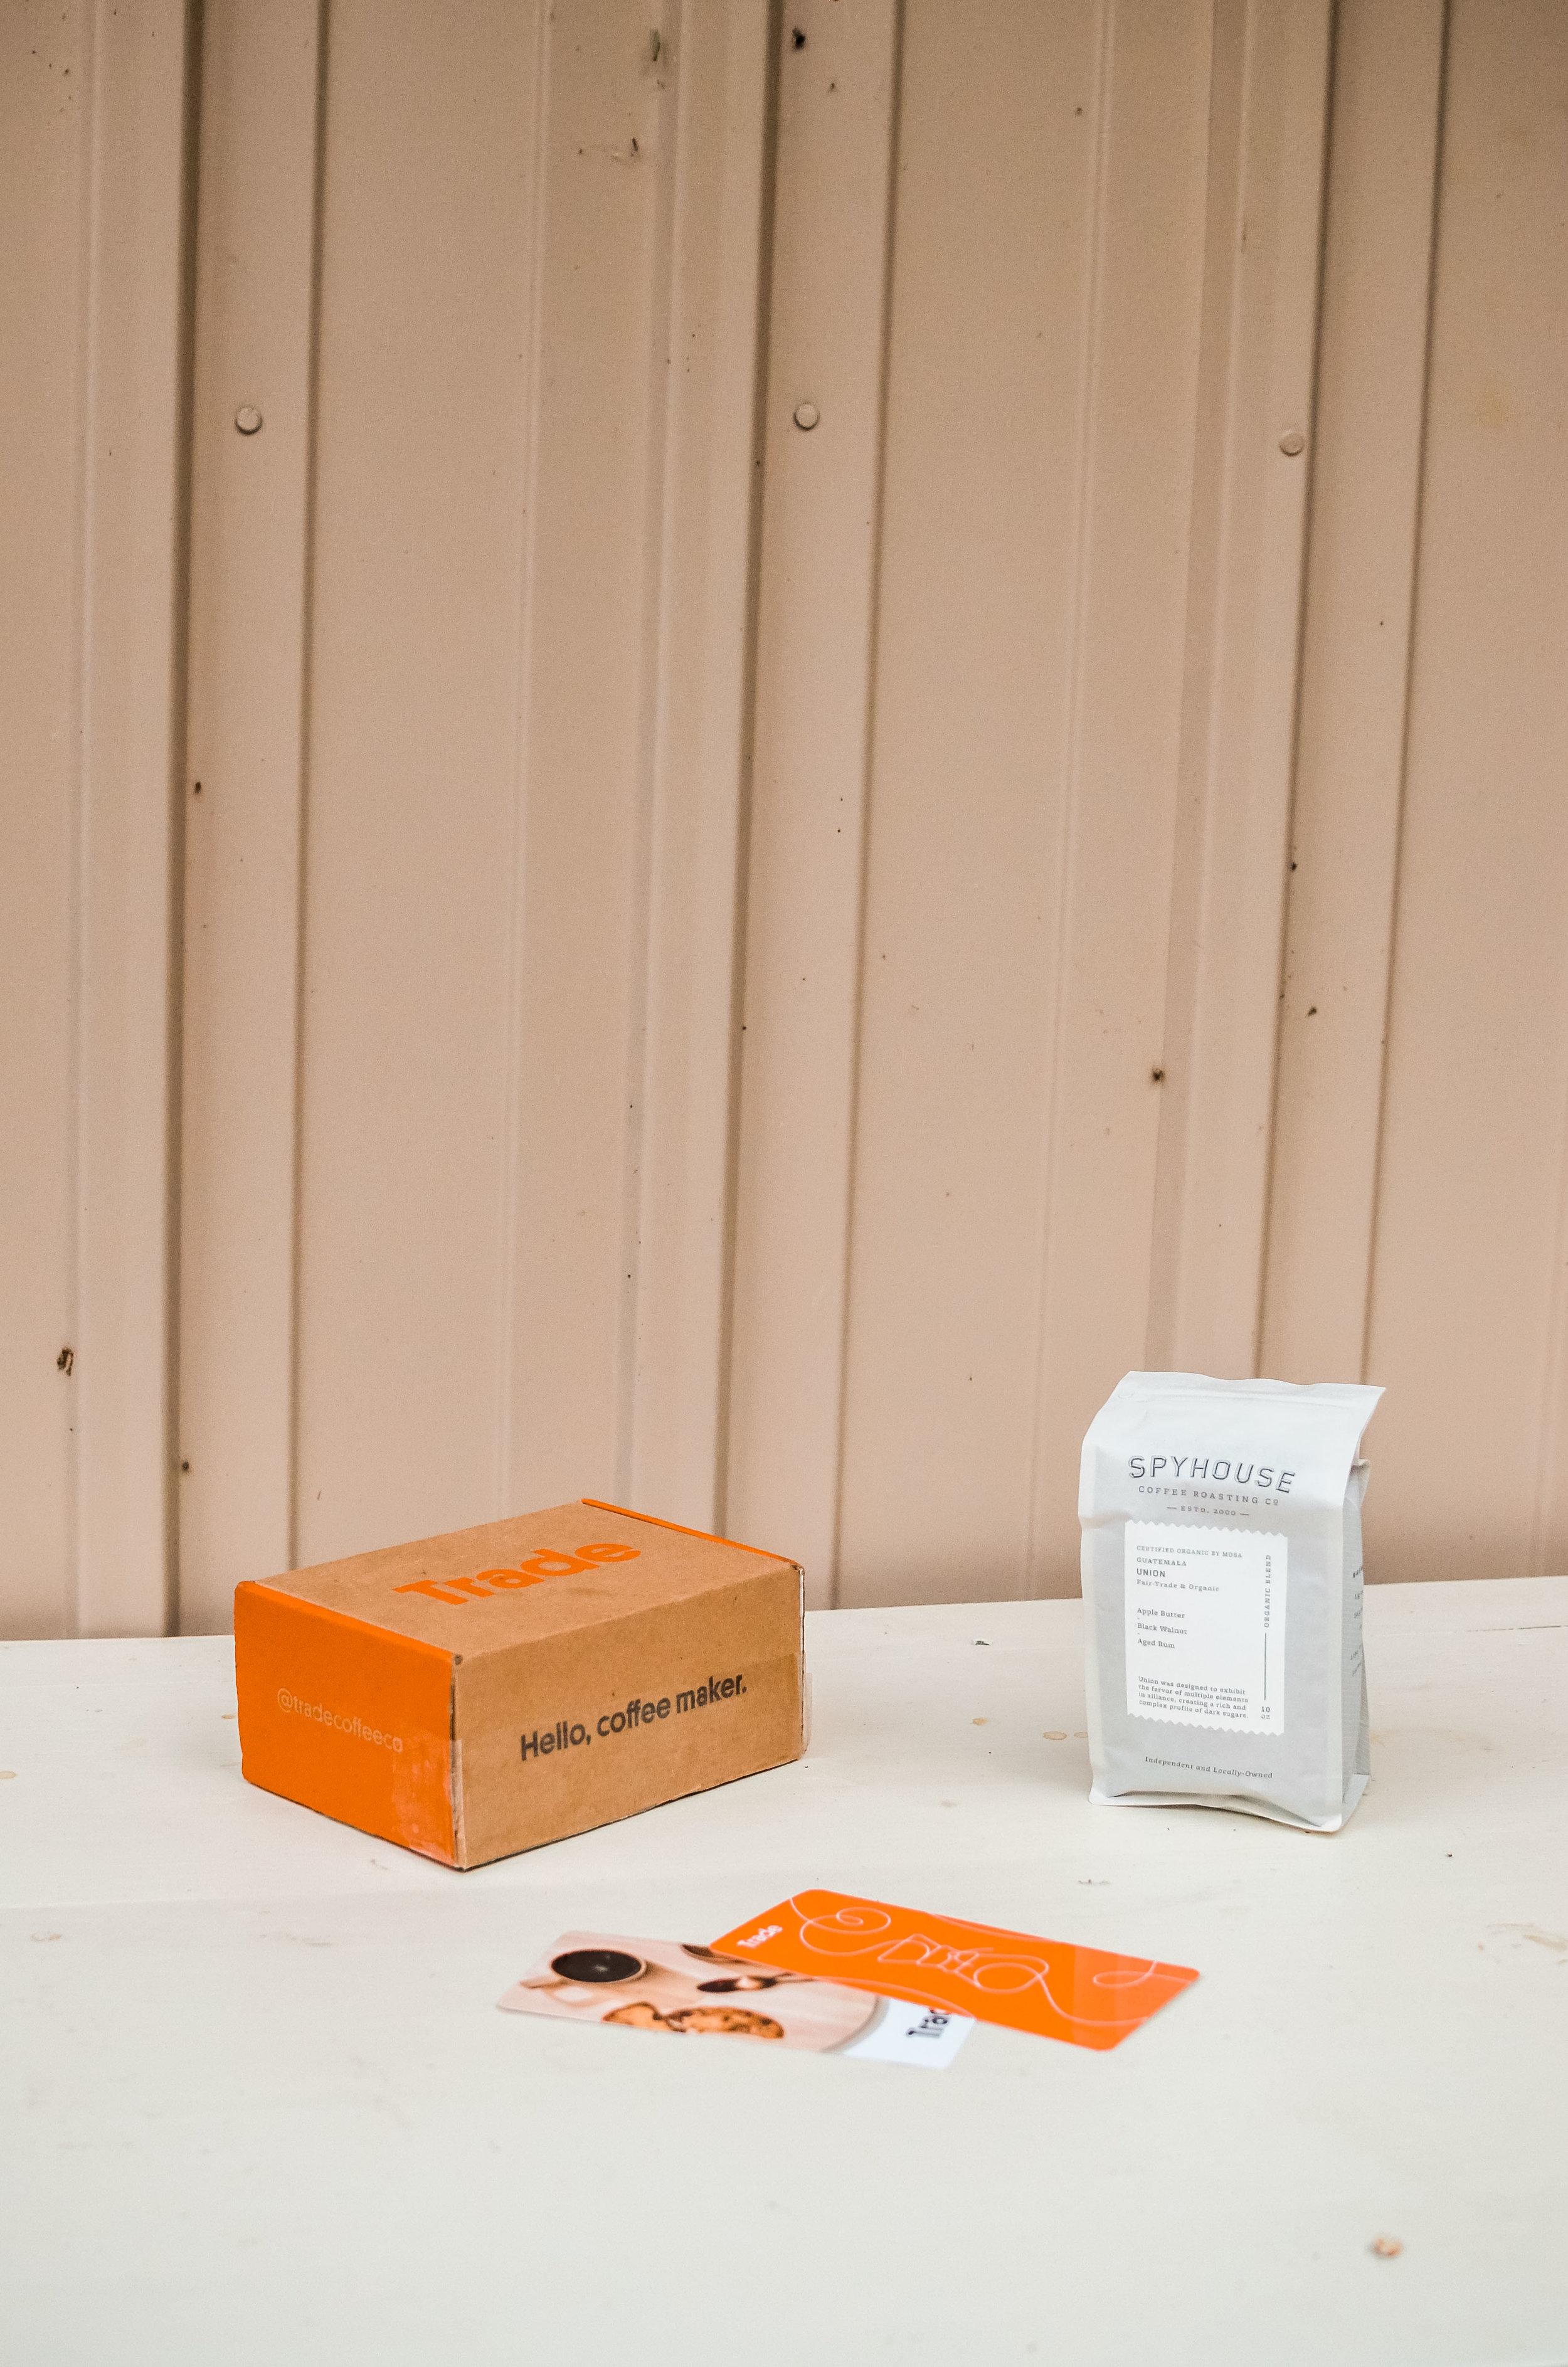 Wendling_Boyd_Trade_Coffee_Co_Spyhouse_Coffee-9.jpg